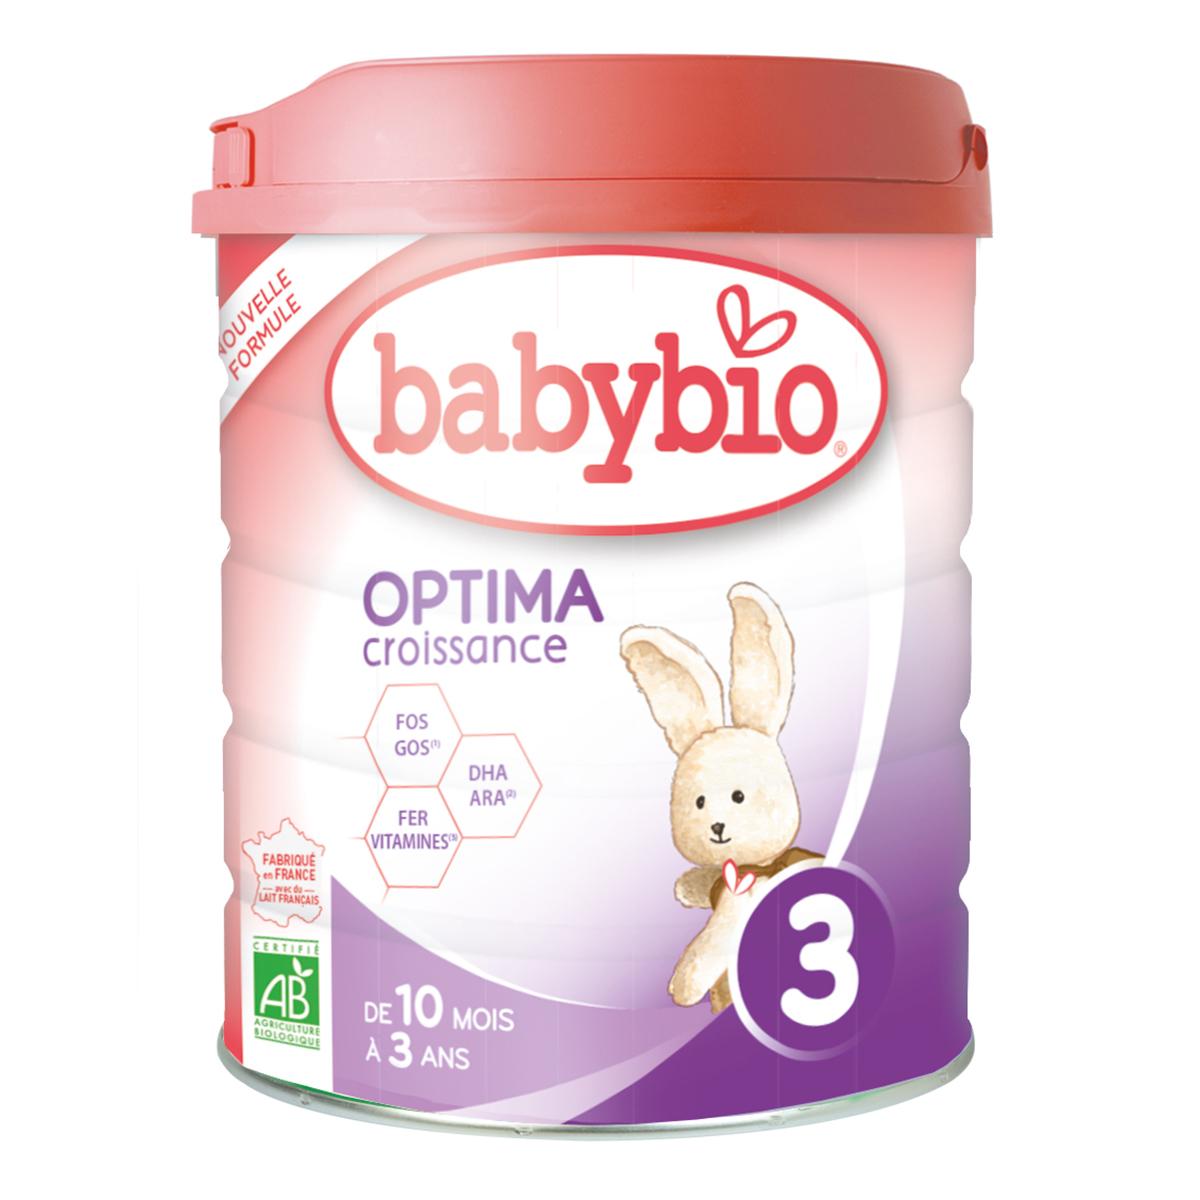 babybio 58033 1108004